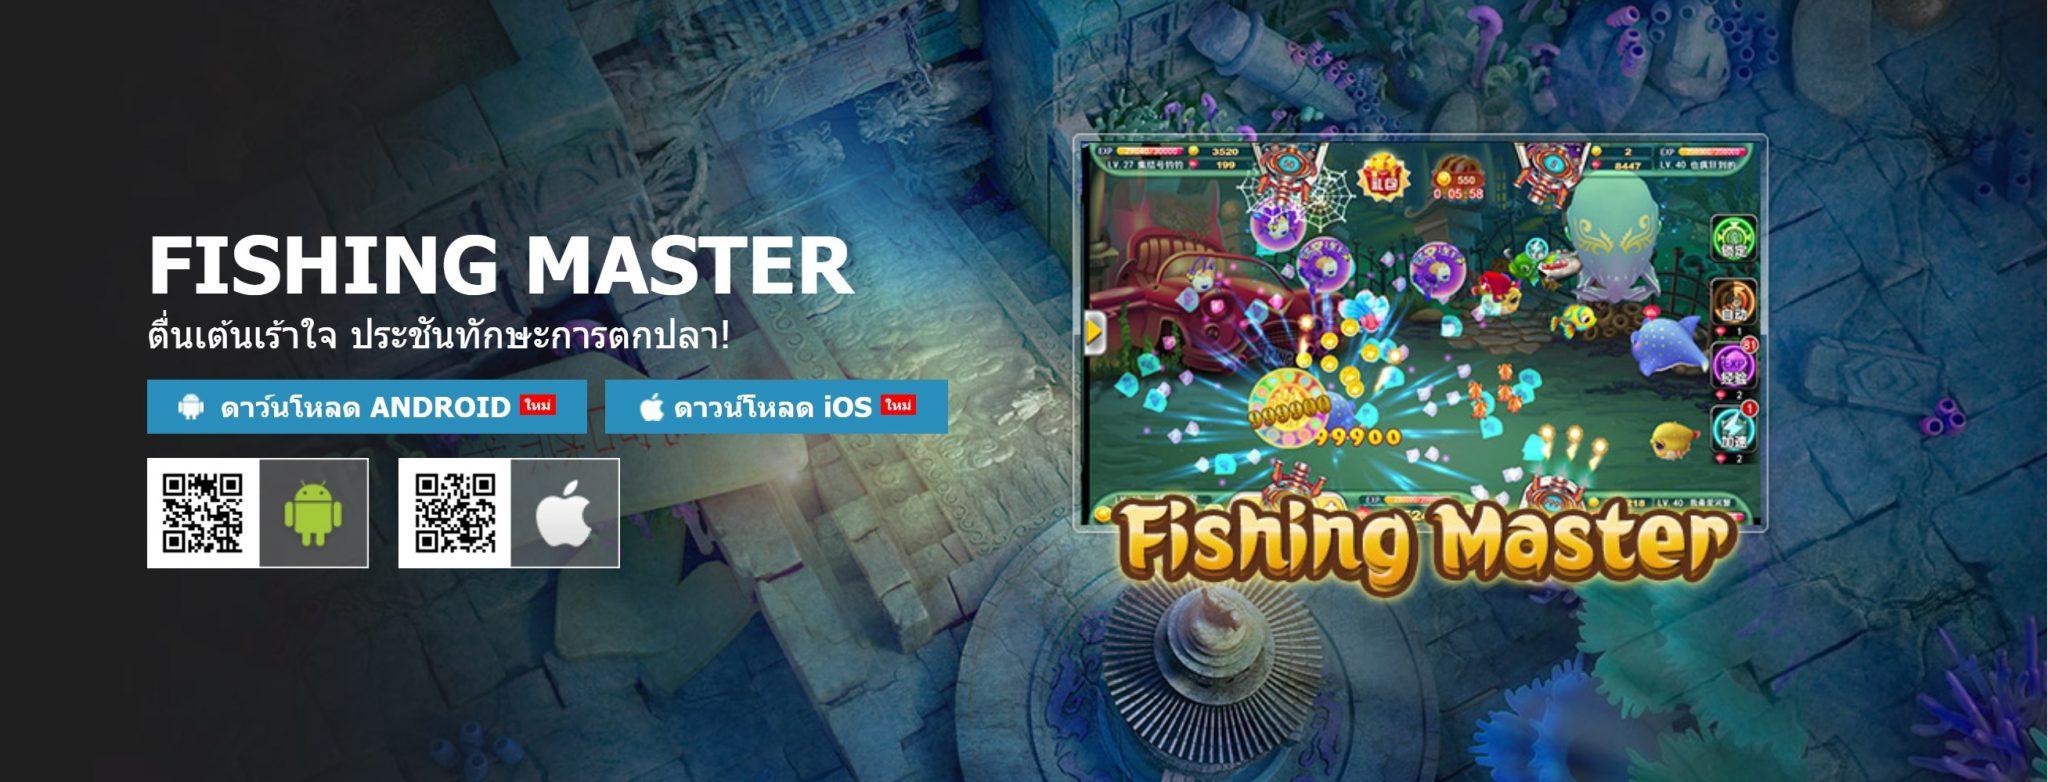 w88 เกมส์ยิงปลา fishing master